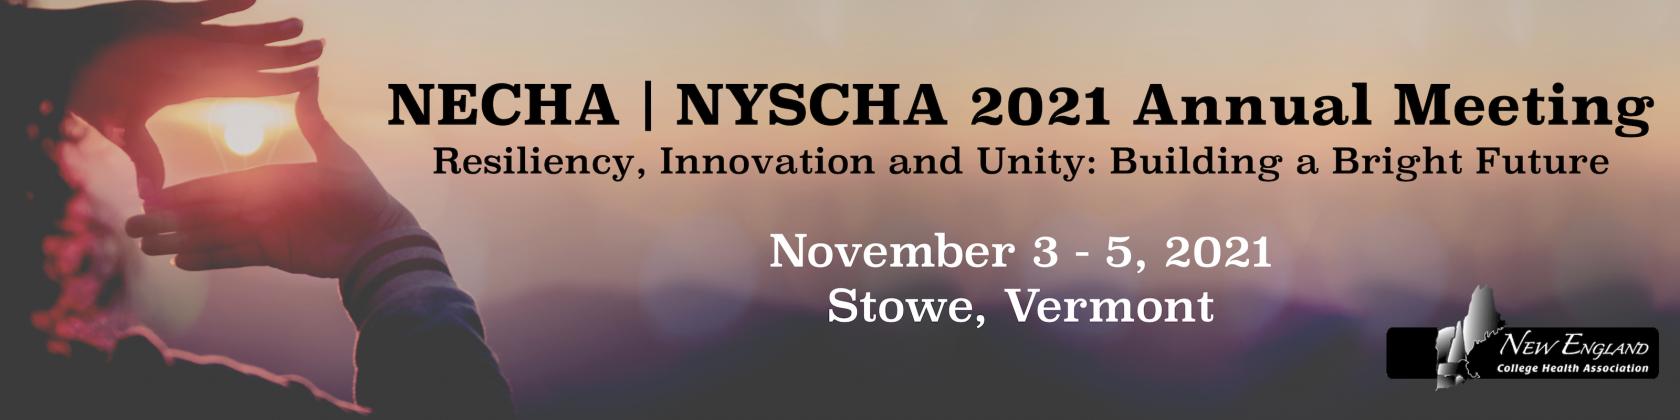 NECHA 2021 Web Banner FINAL